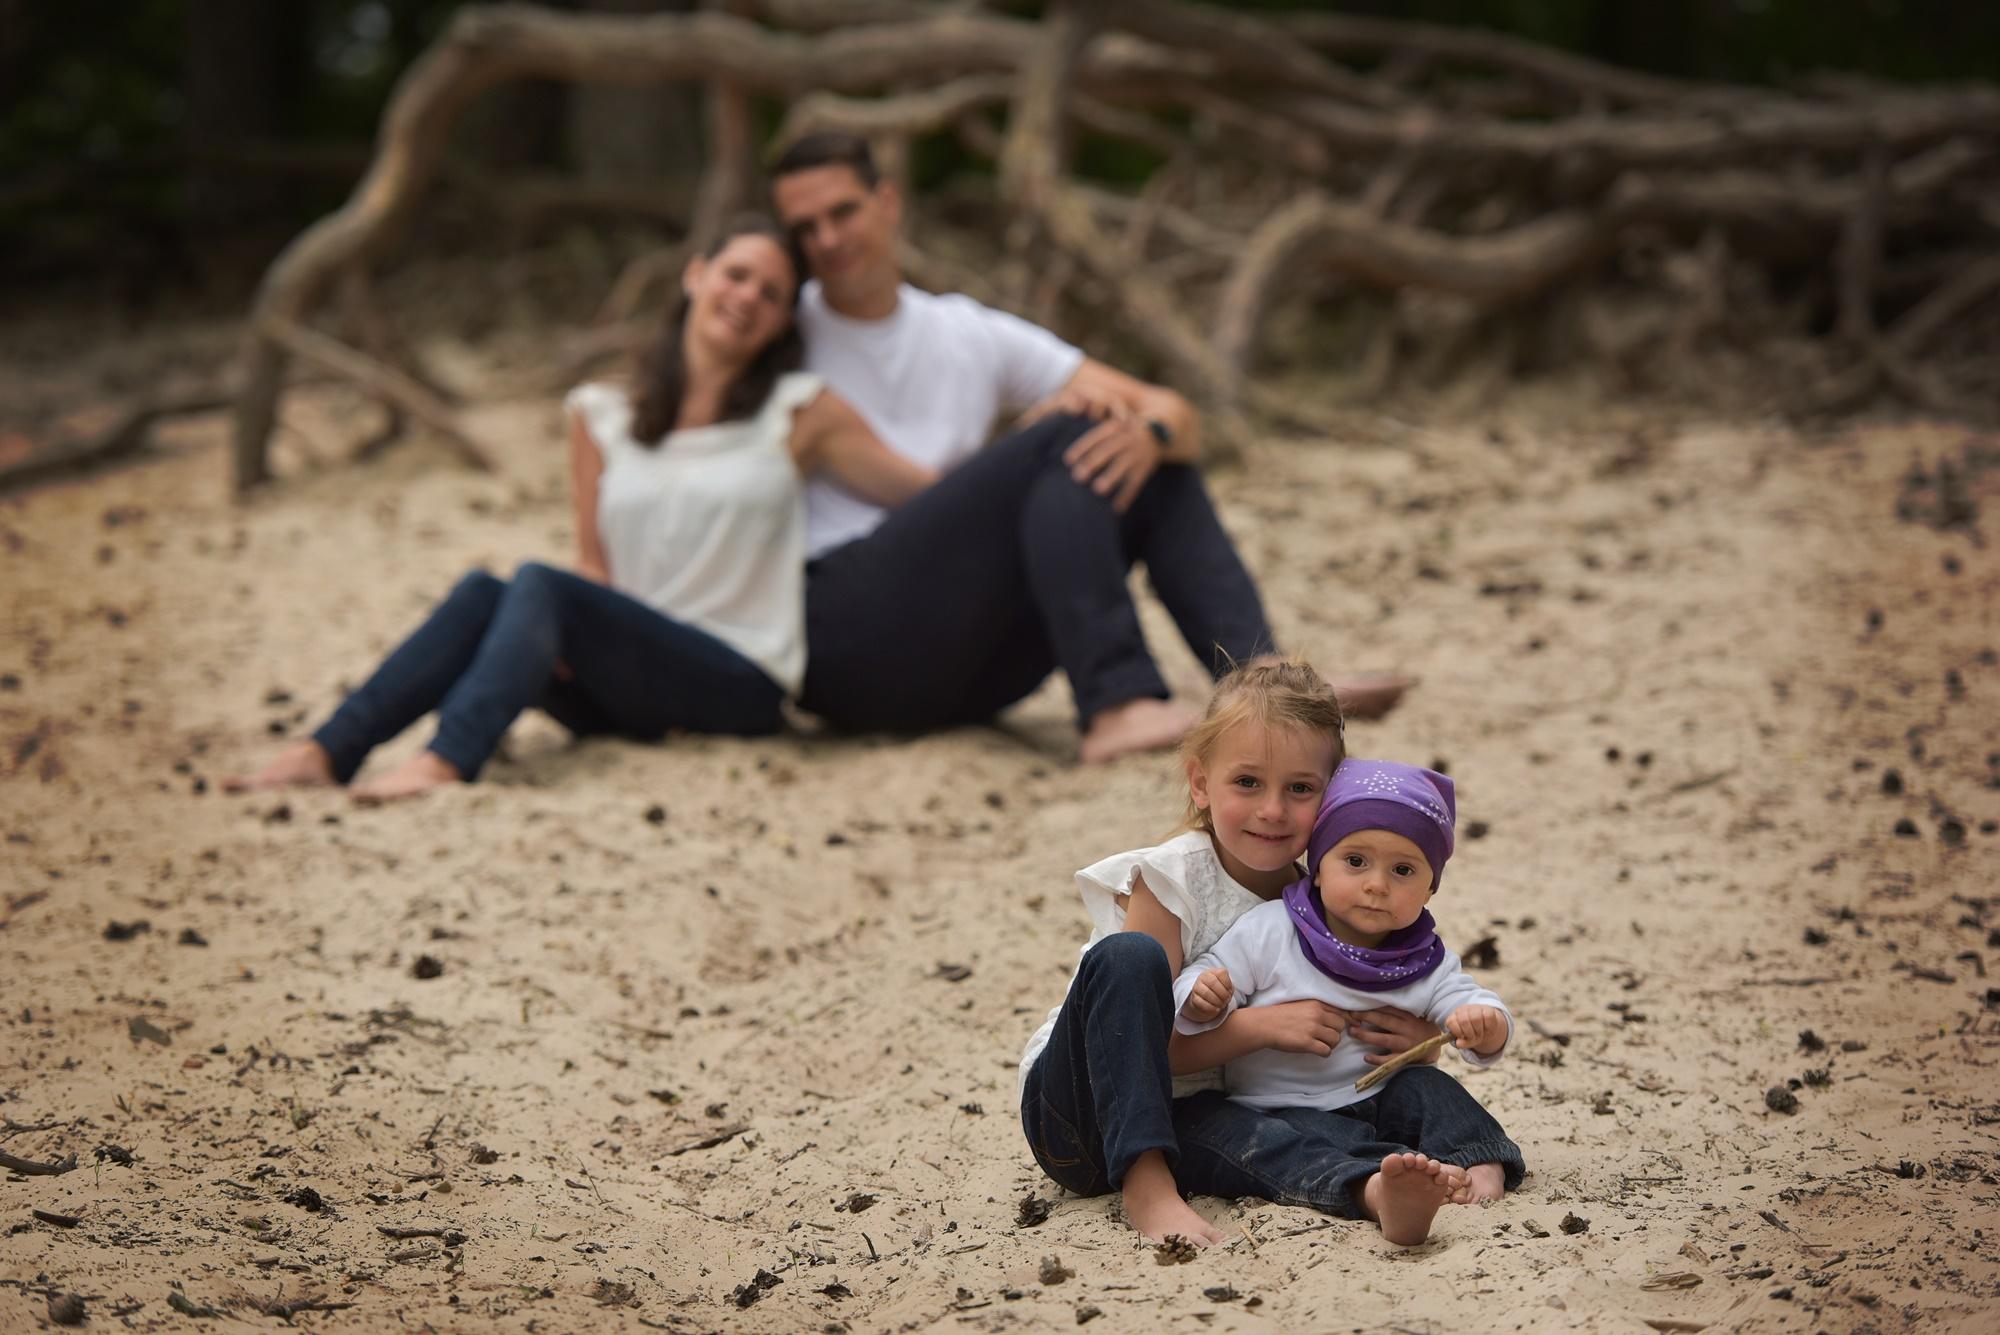 Familienfotografie Halle Saale